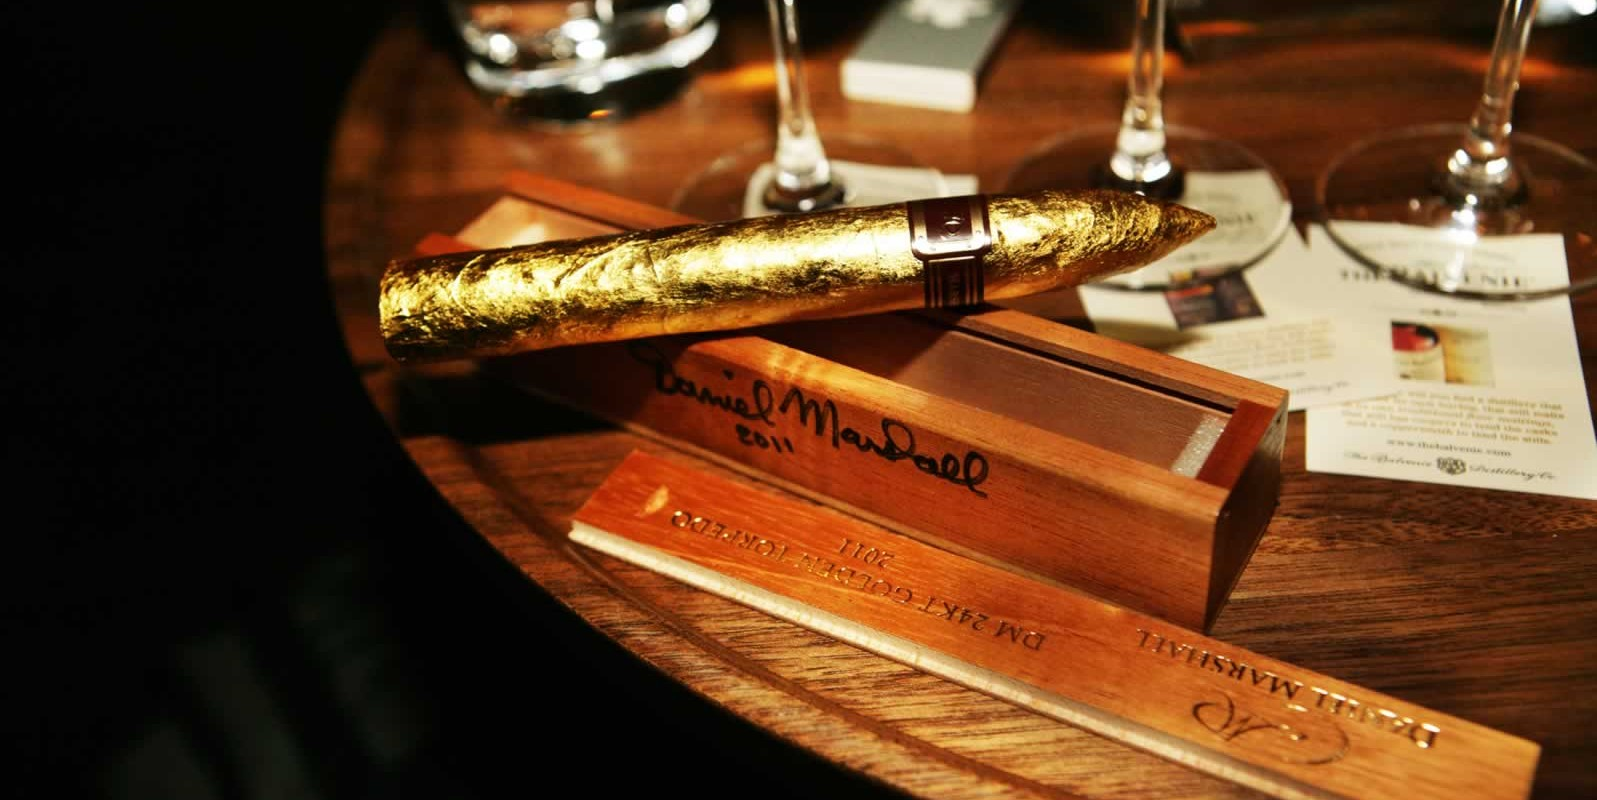 14-Daniel-Marshall-Red-Label-24kt-Golden-Cigar-Exclusive-Premier-Bulgari-Hotel-Cigar-Lounge-London-June-2013-